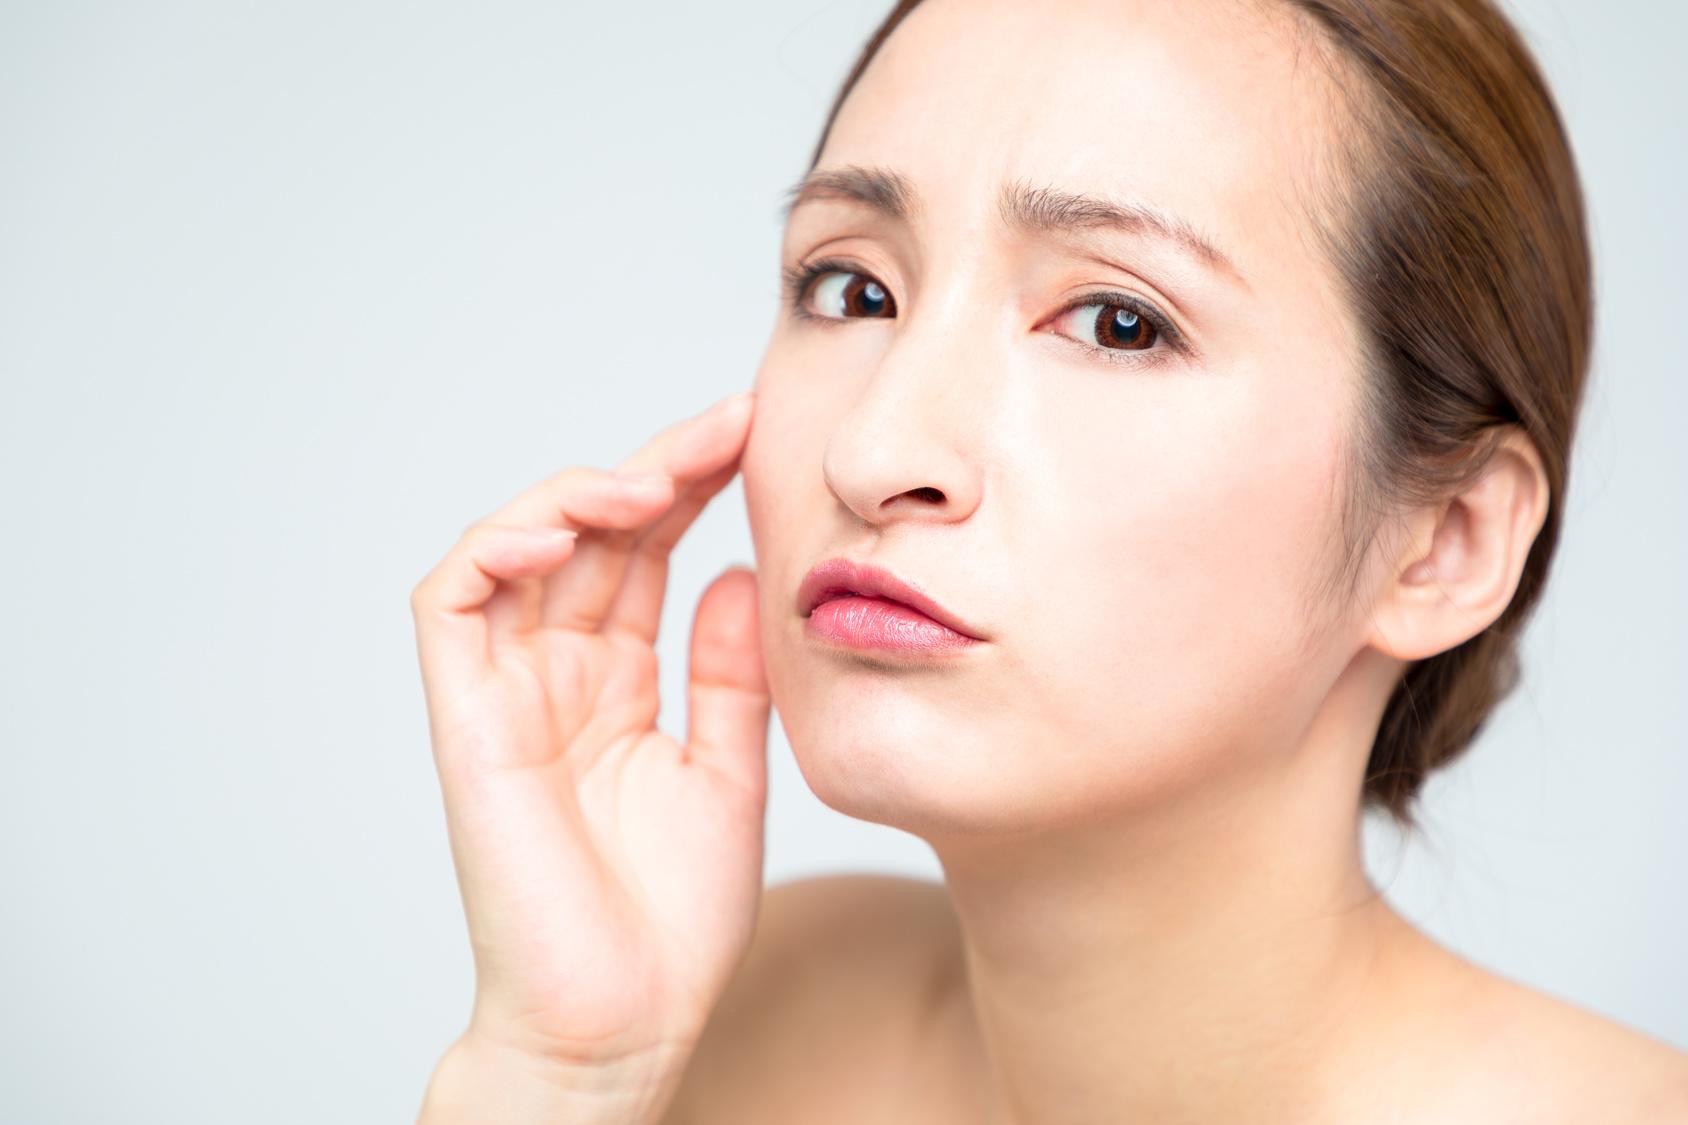 img 5a4cd4fca5533.png - 敏感肌でも使える!おすすめの化粧水